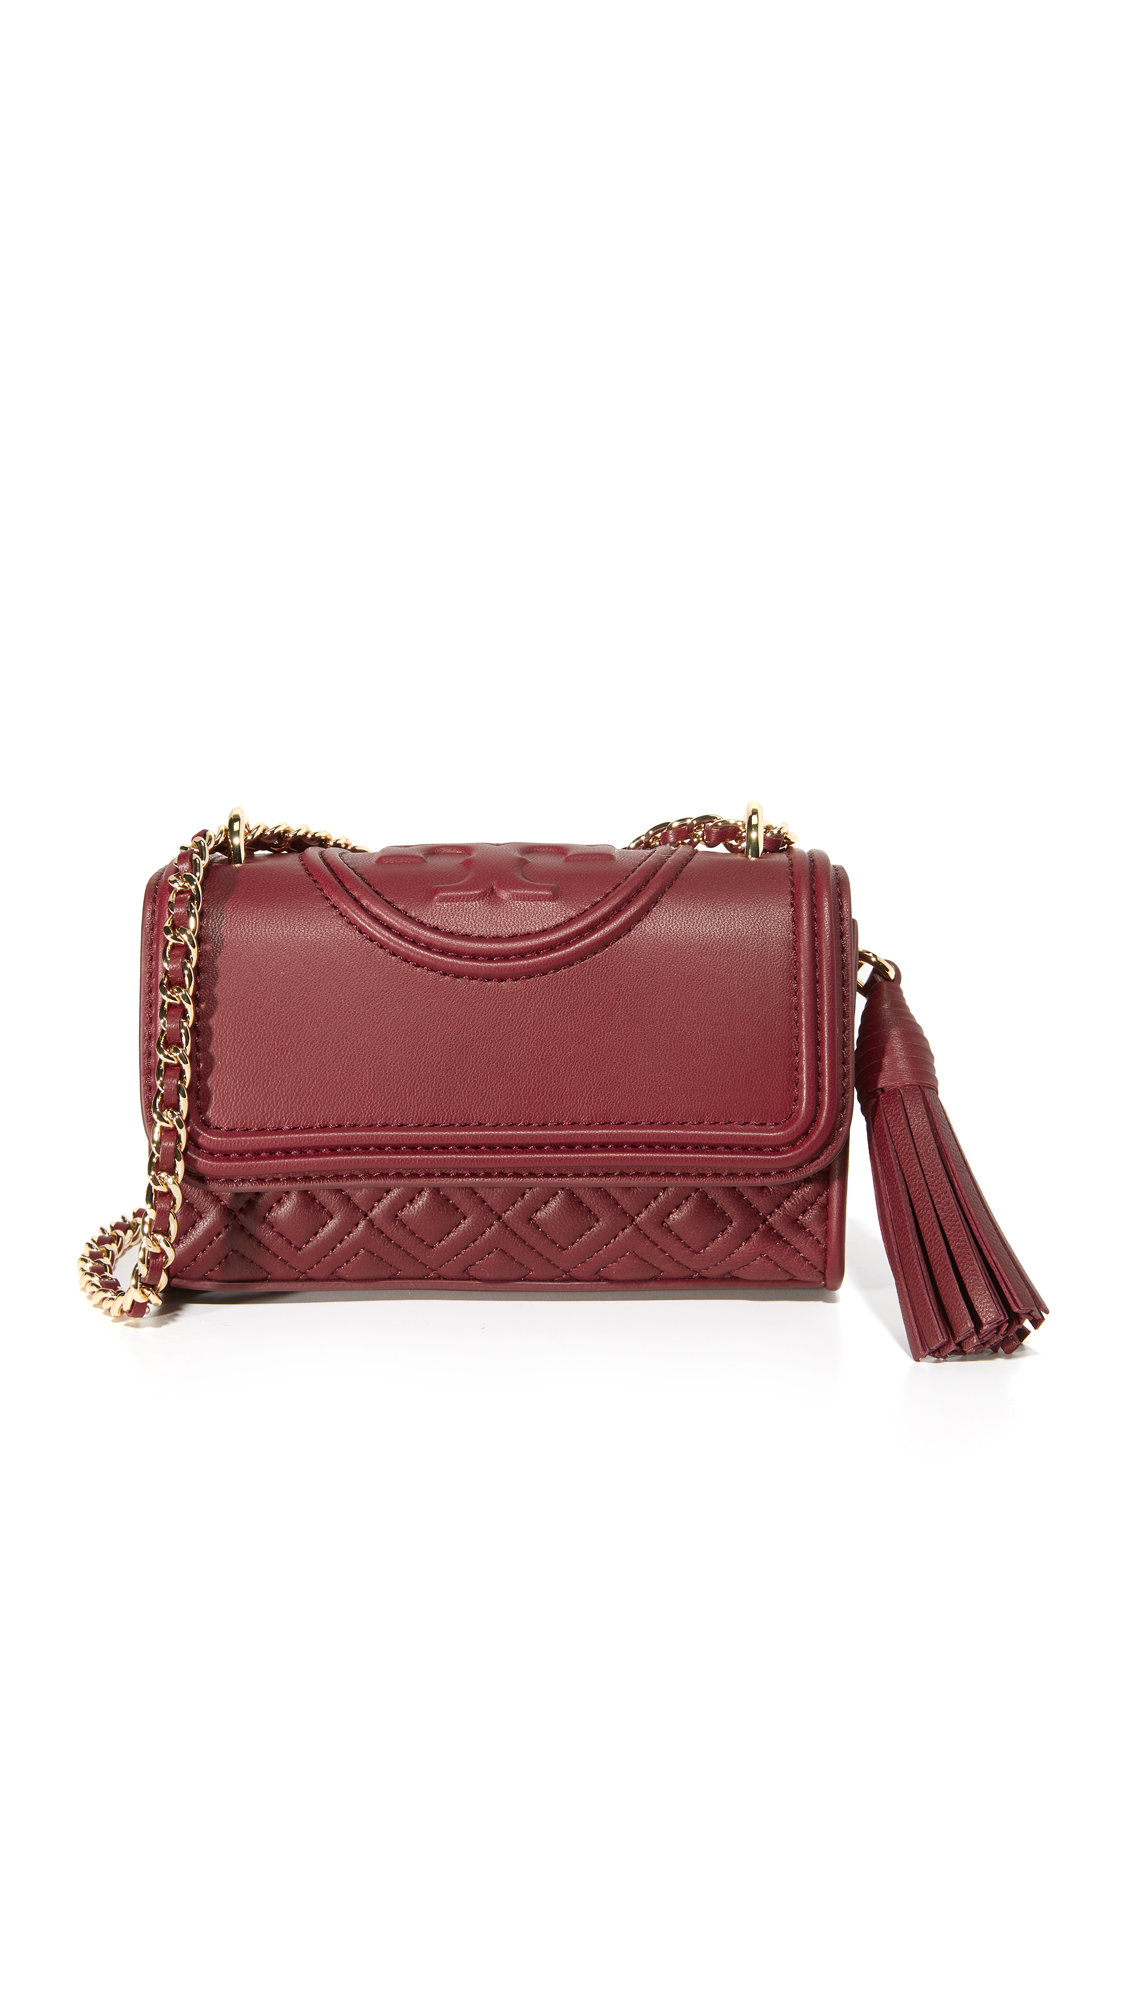 8fe0a19240aa ... low price tory burch micro fleming bag shopbop e4d2d 0a159